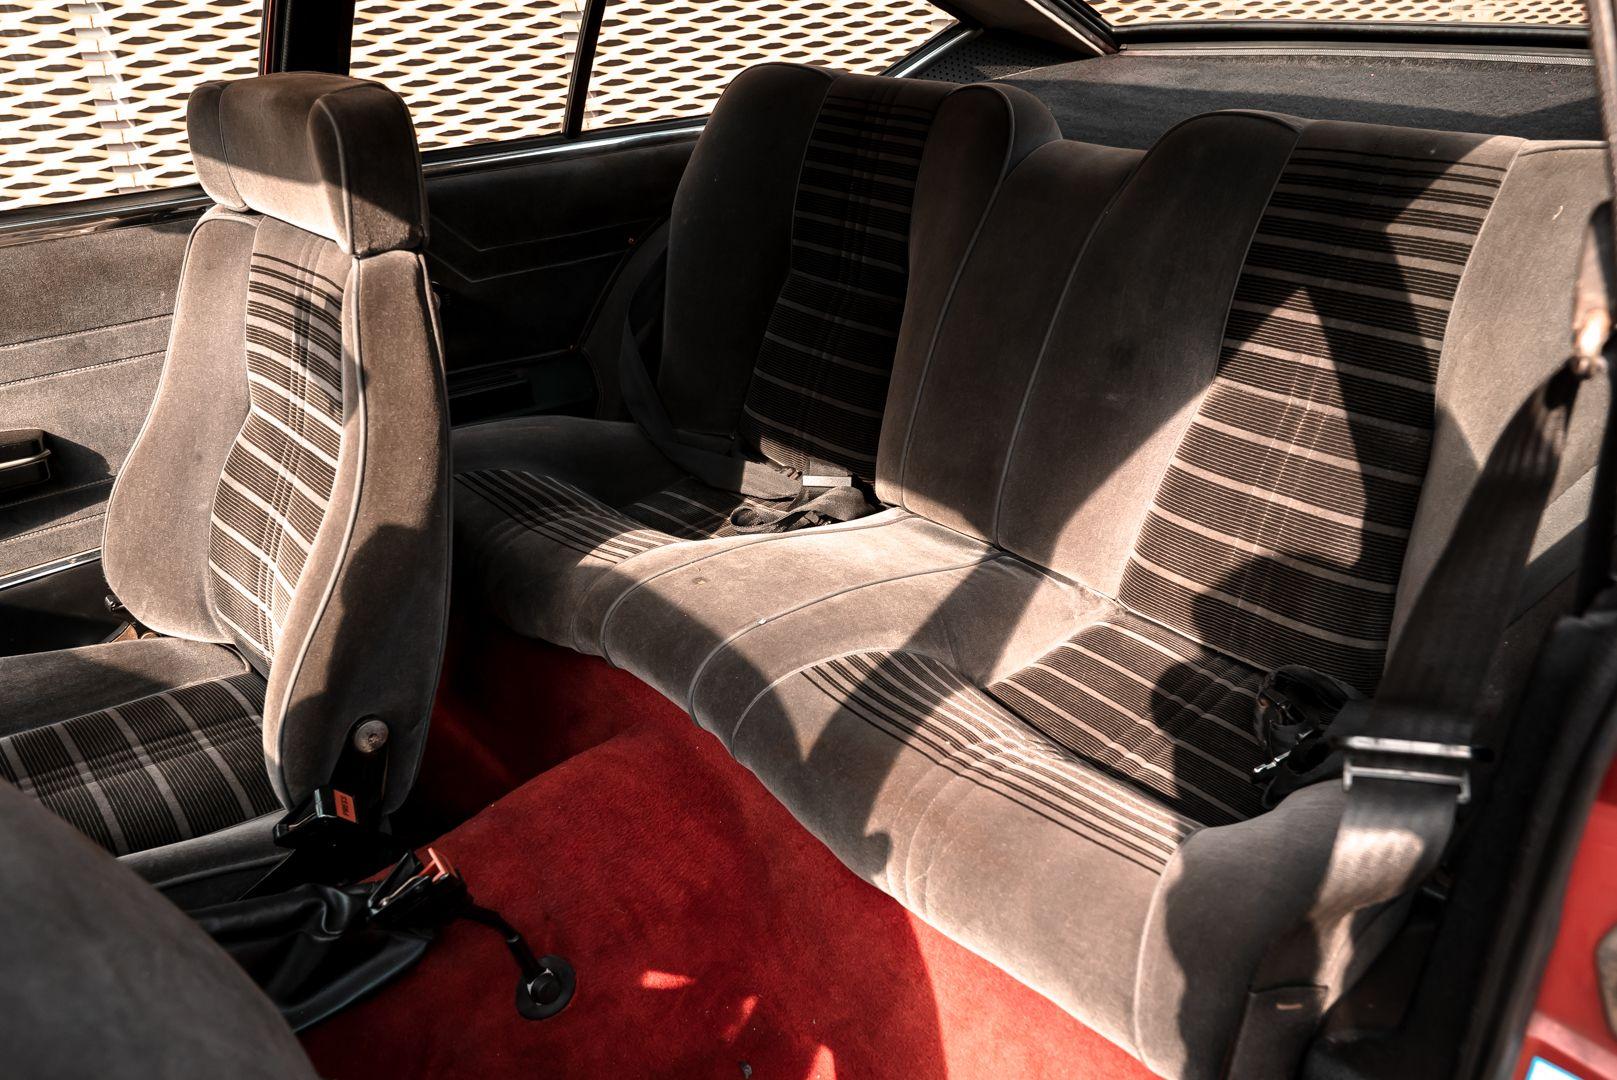 1981 Alfa Romeo Alfetta GTV Gran Prix n.128 68585